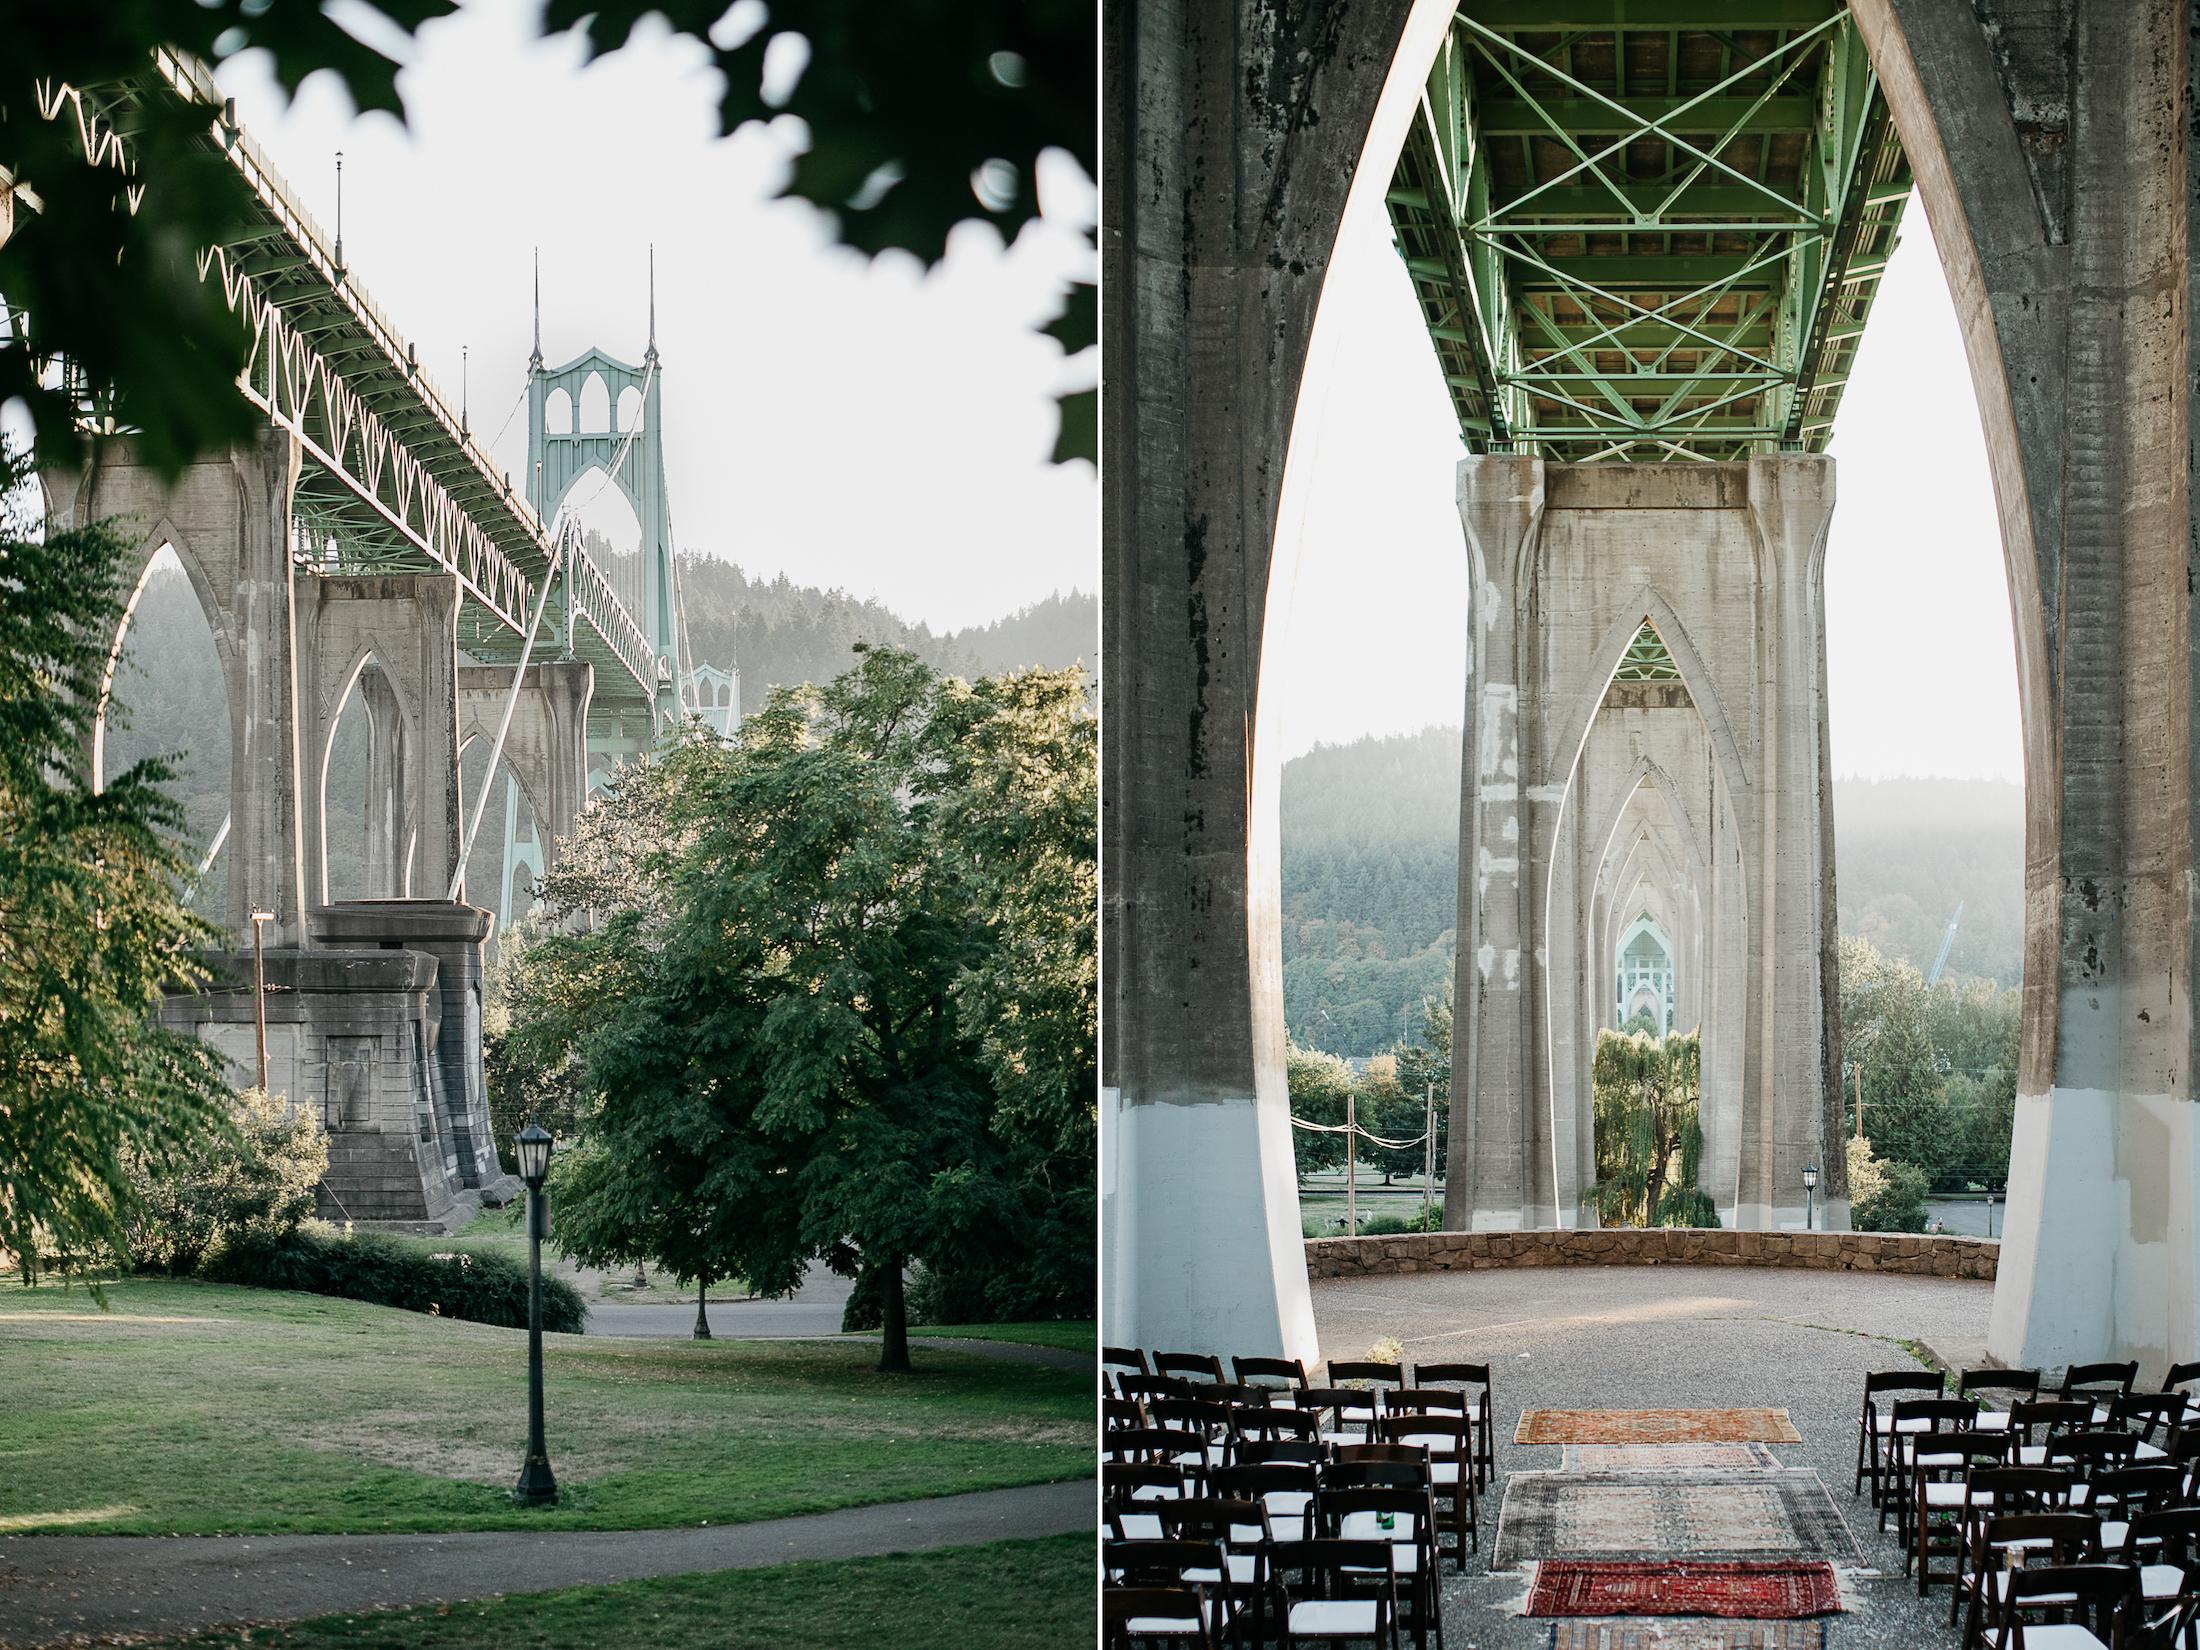 cathedral-park-wedding-photographer09.jpg